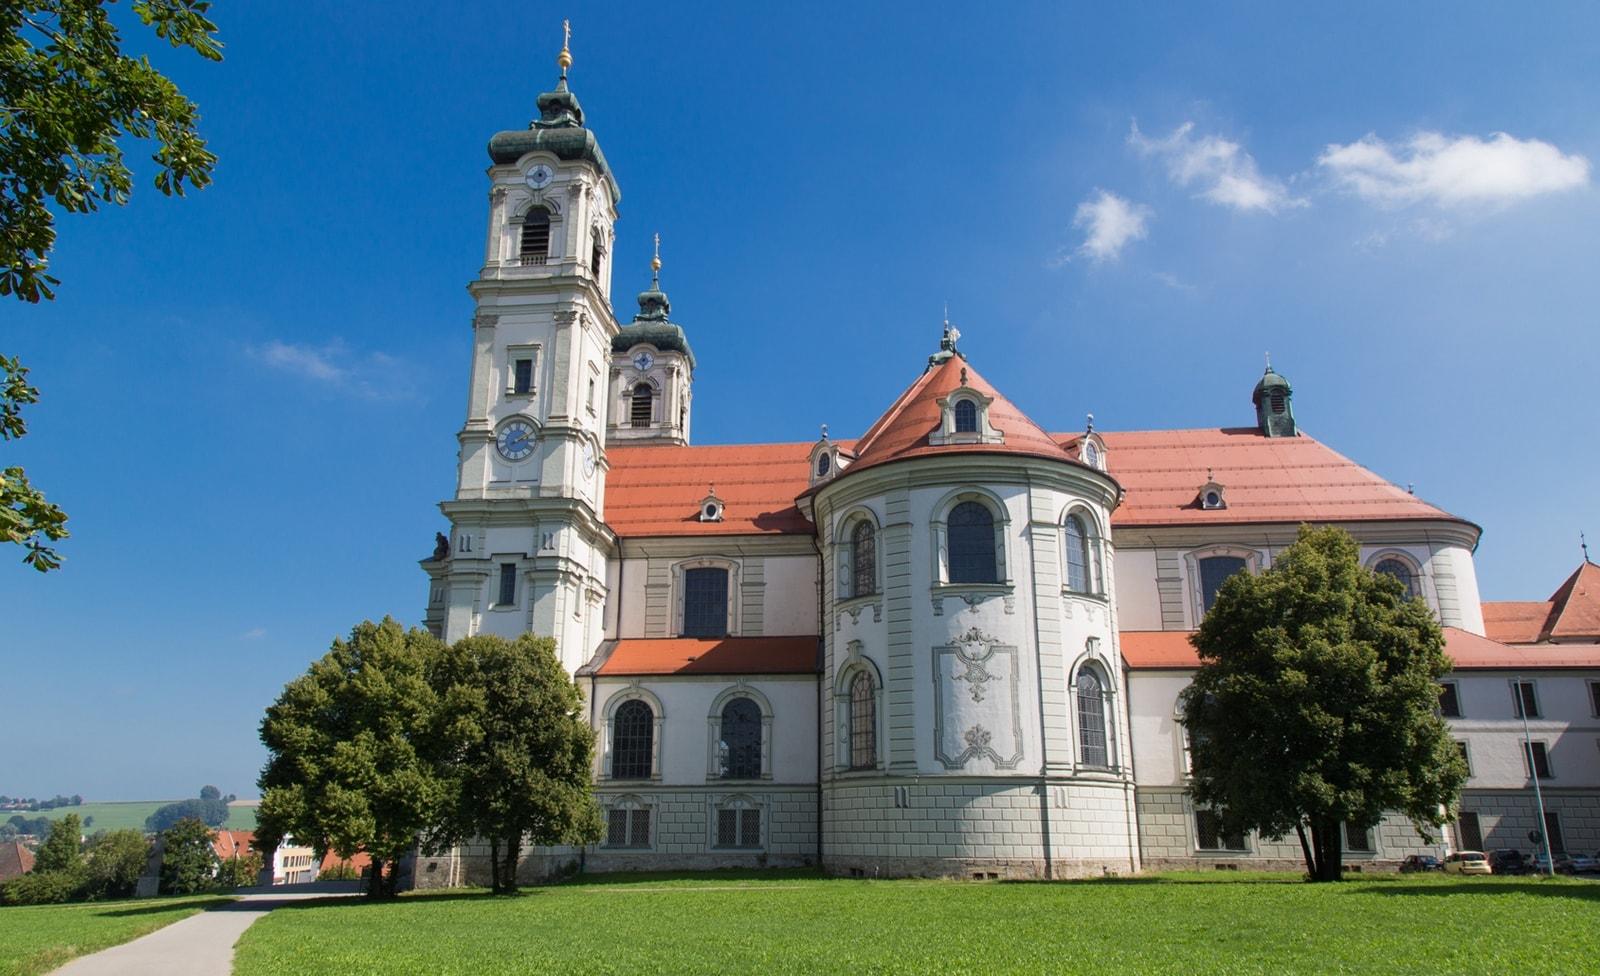 Kloster in Bayern